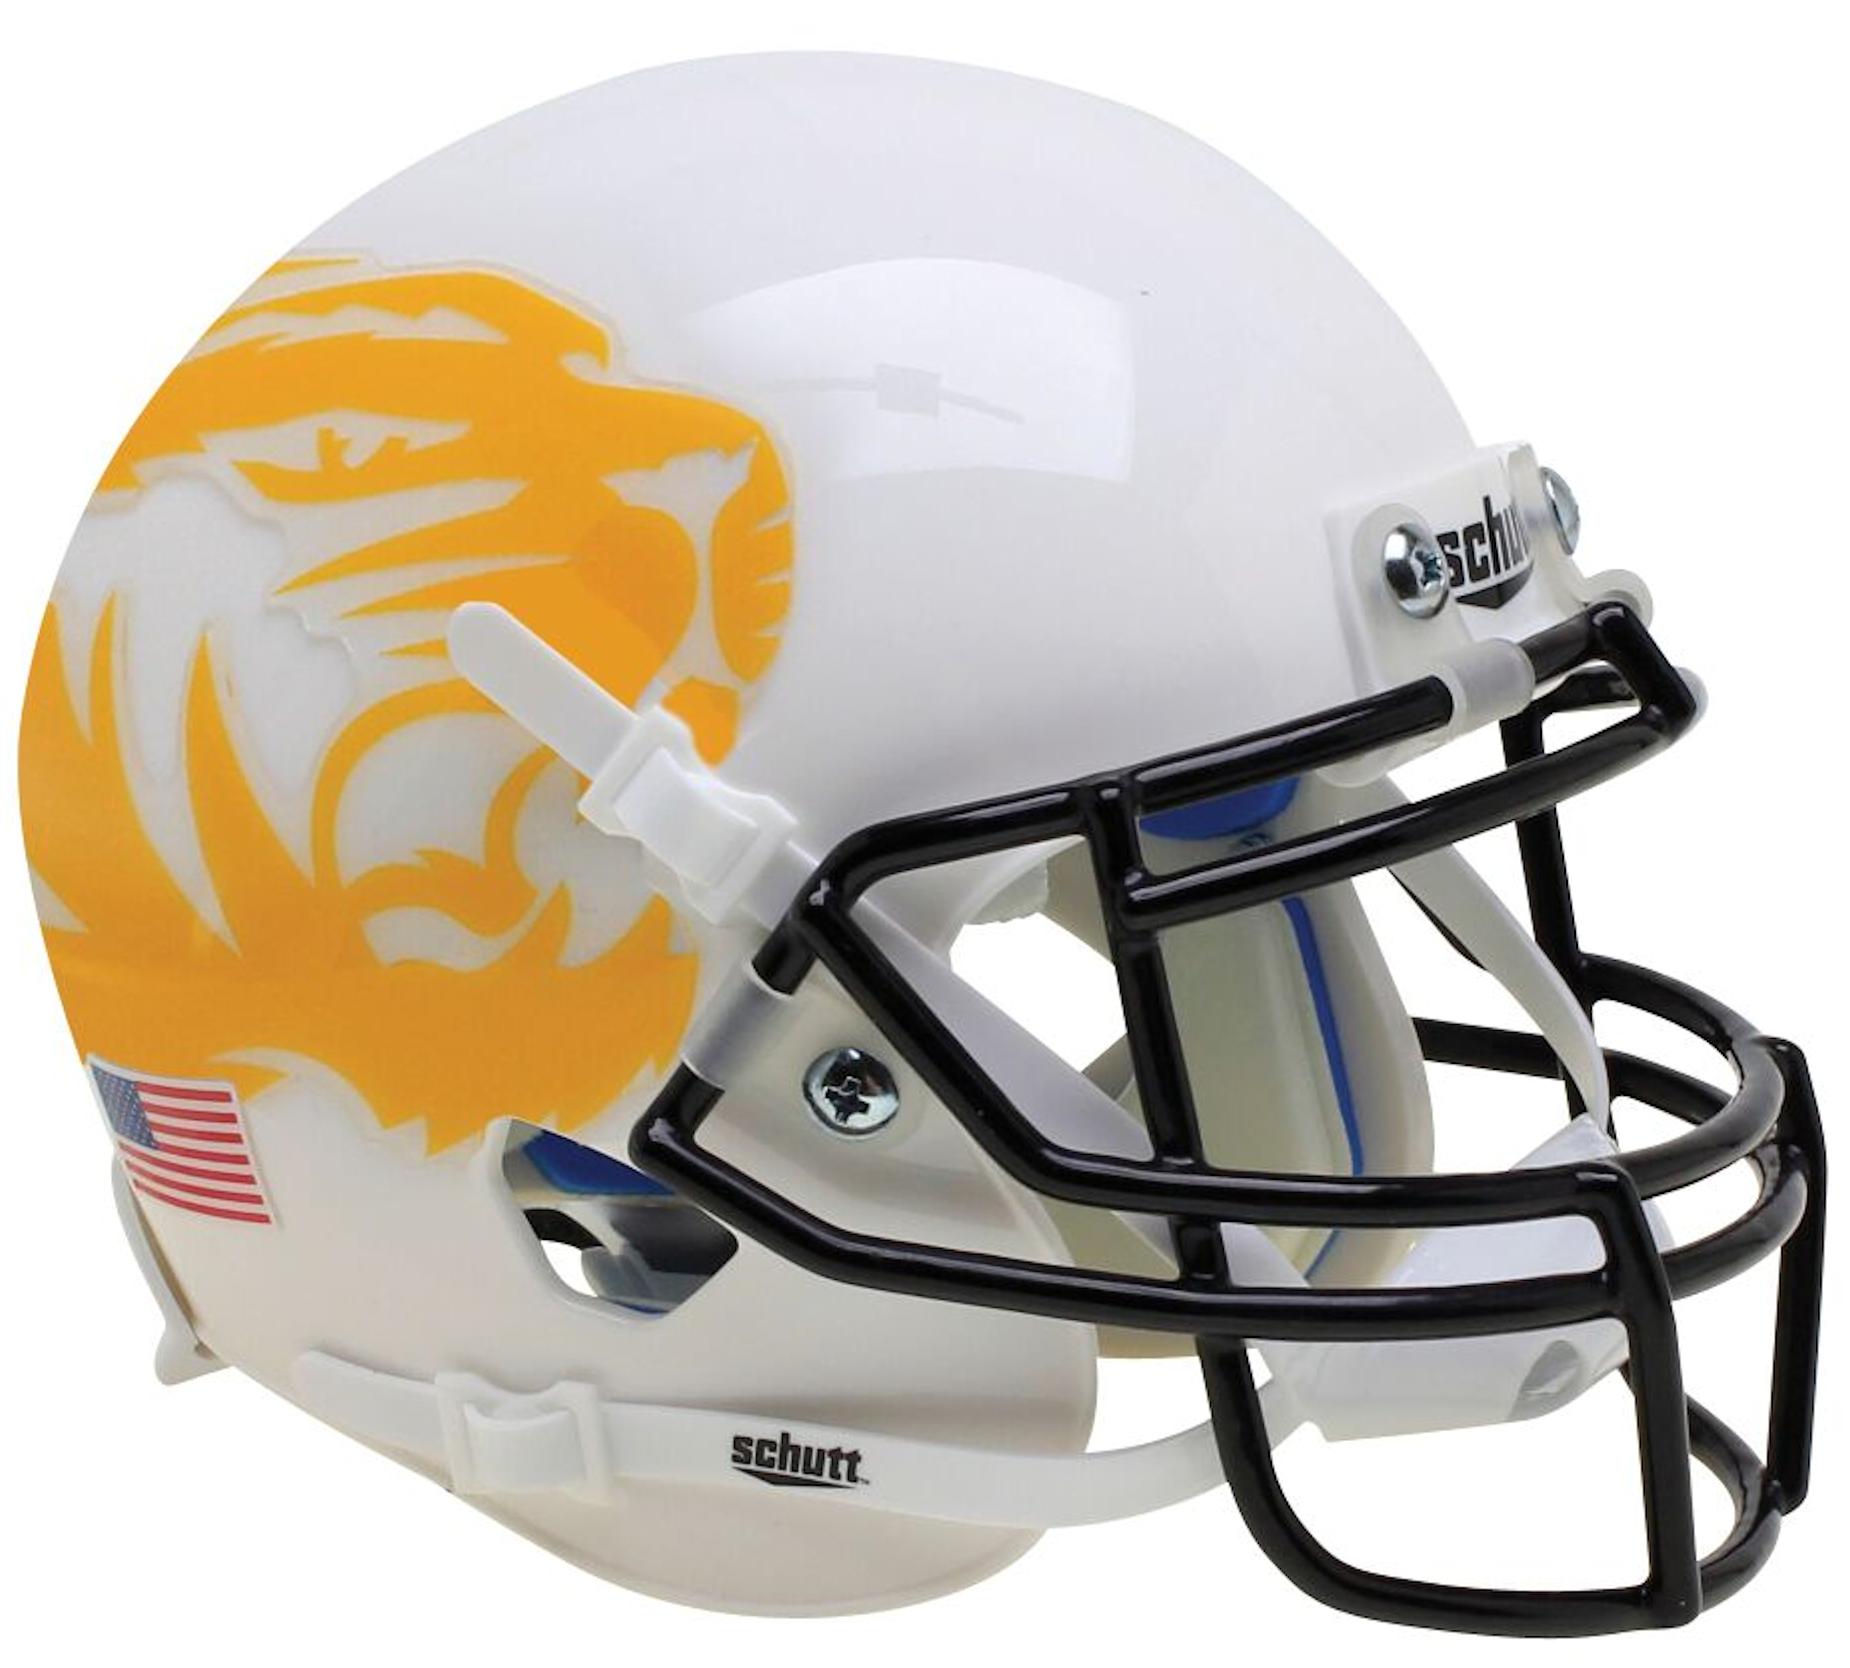 Missouri Tigers Authentic College XP Football Helmet Schutt <B>White Yellow Tiger</B>